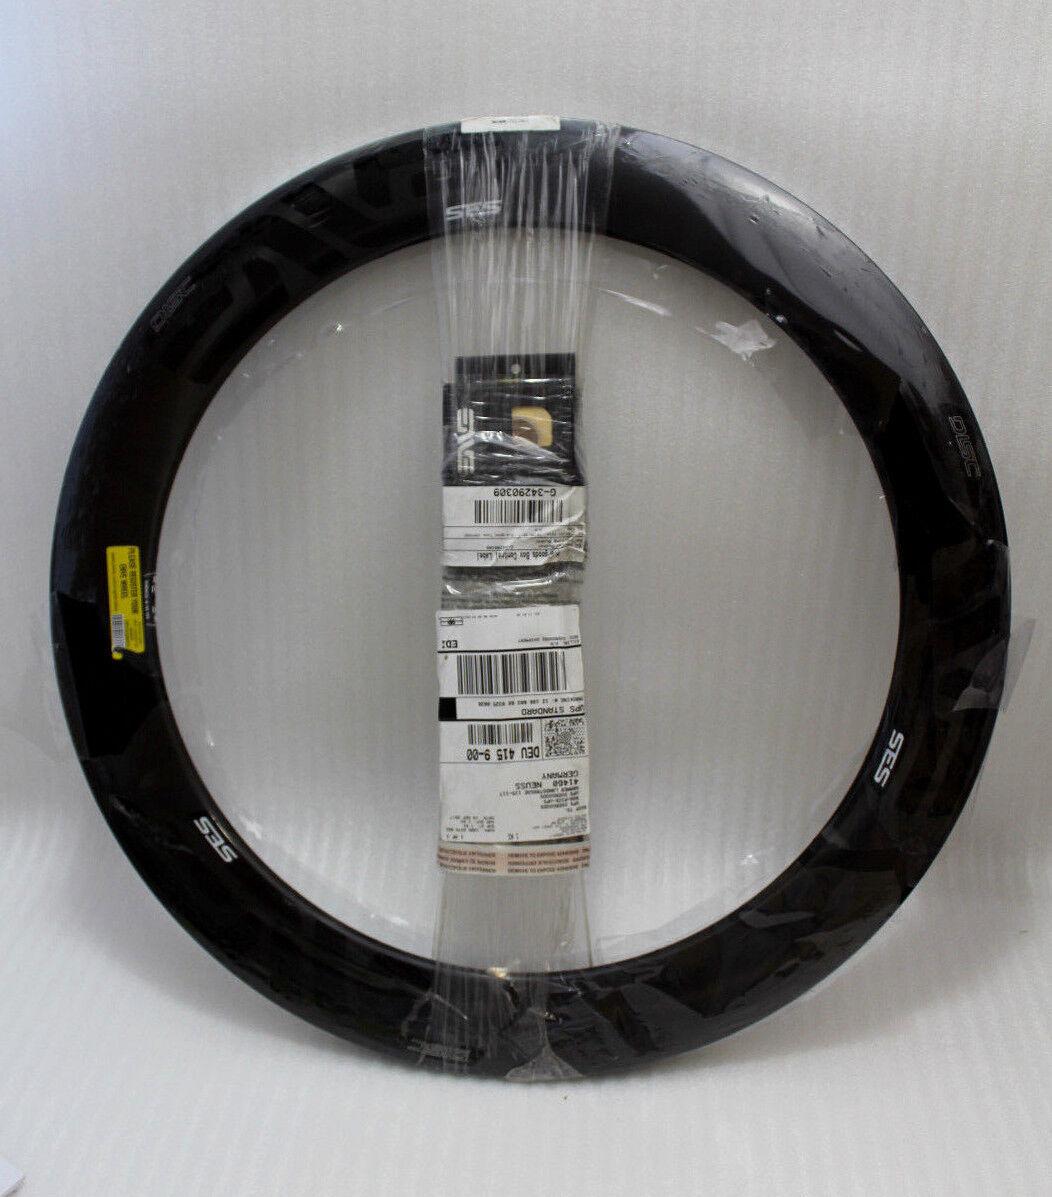 Enve RIM Felge SES 71mm DISC 24H C 96310 RA  black  brand on sale clearance